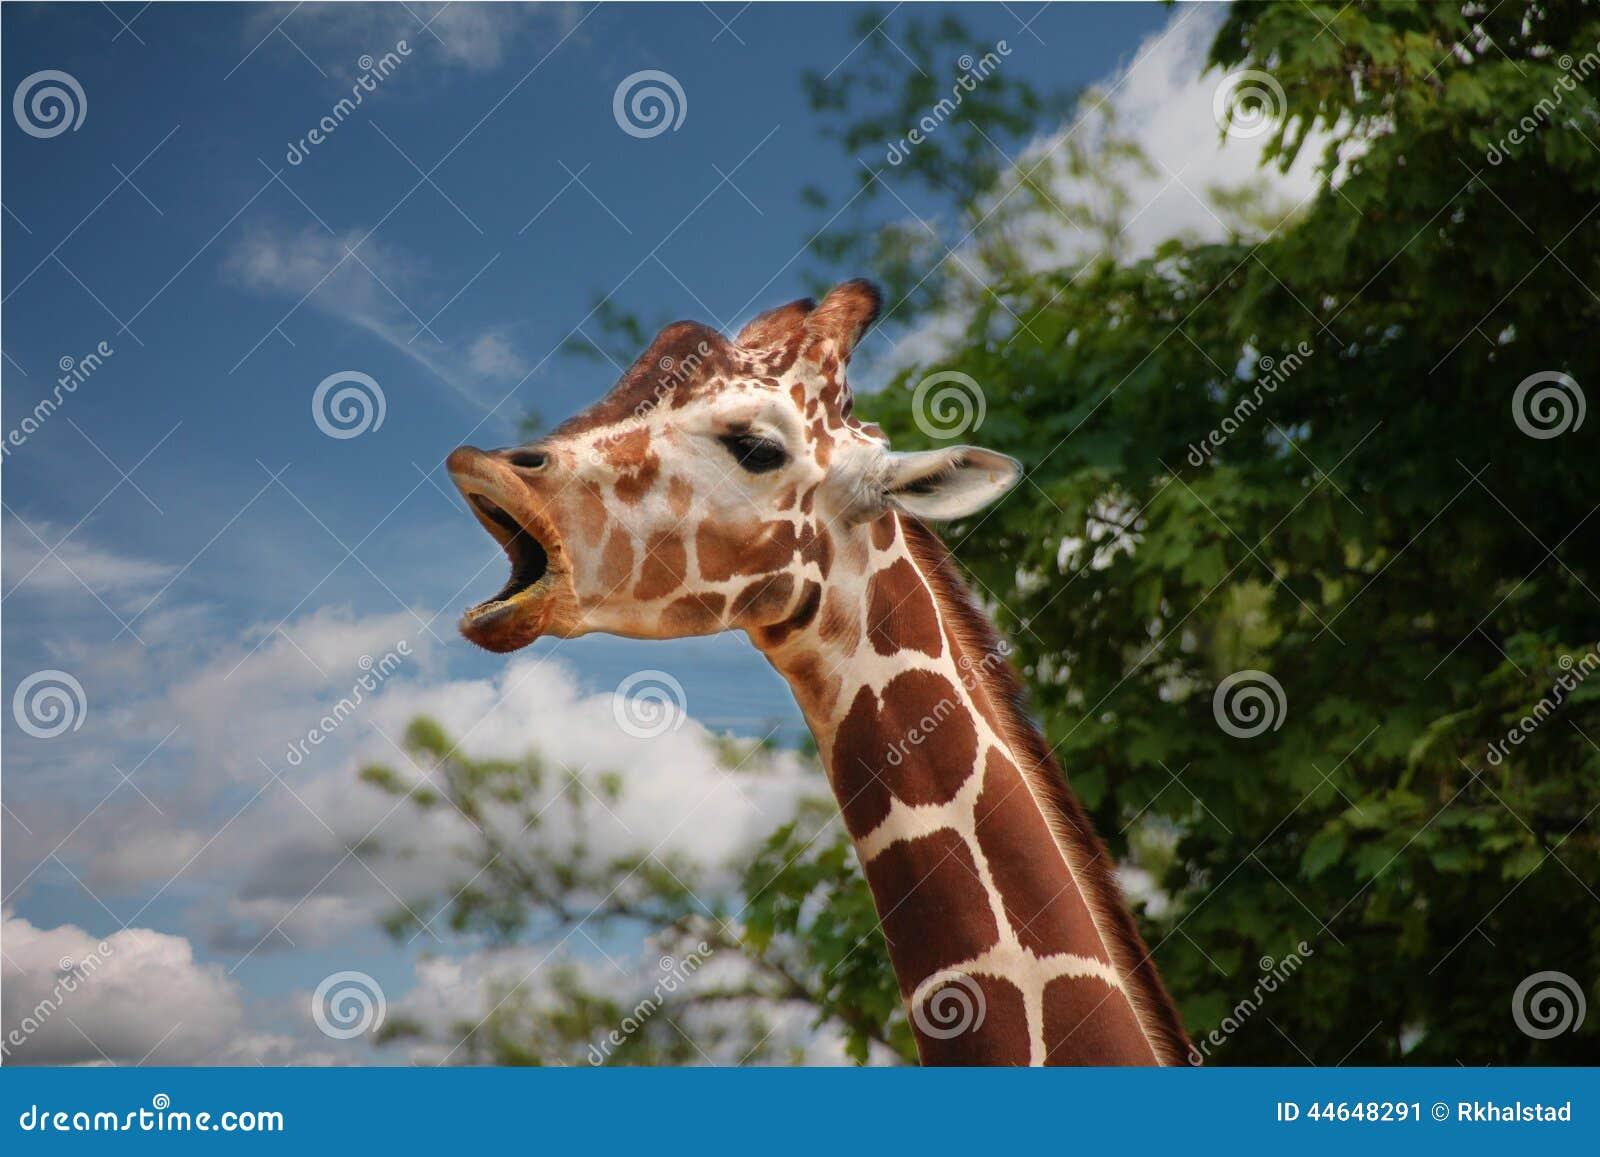 yawning giraffe - photo #7